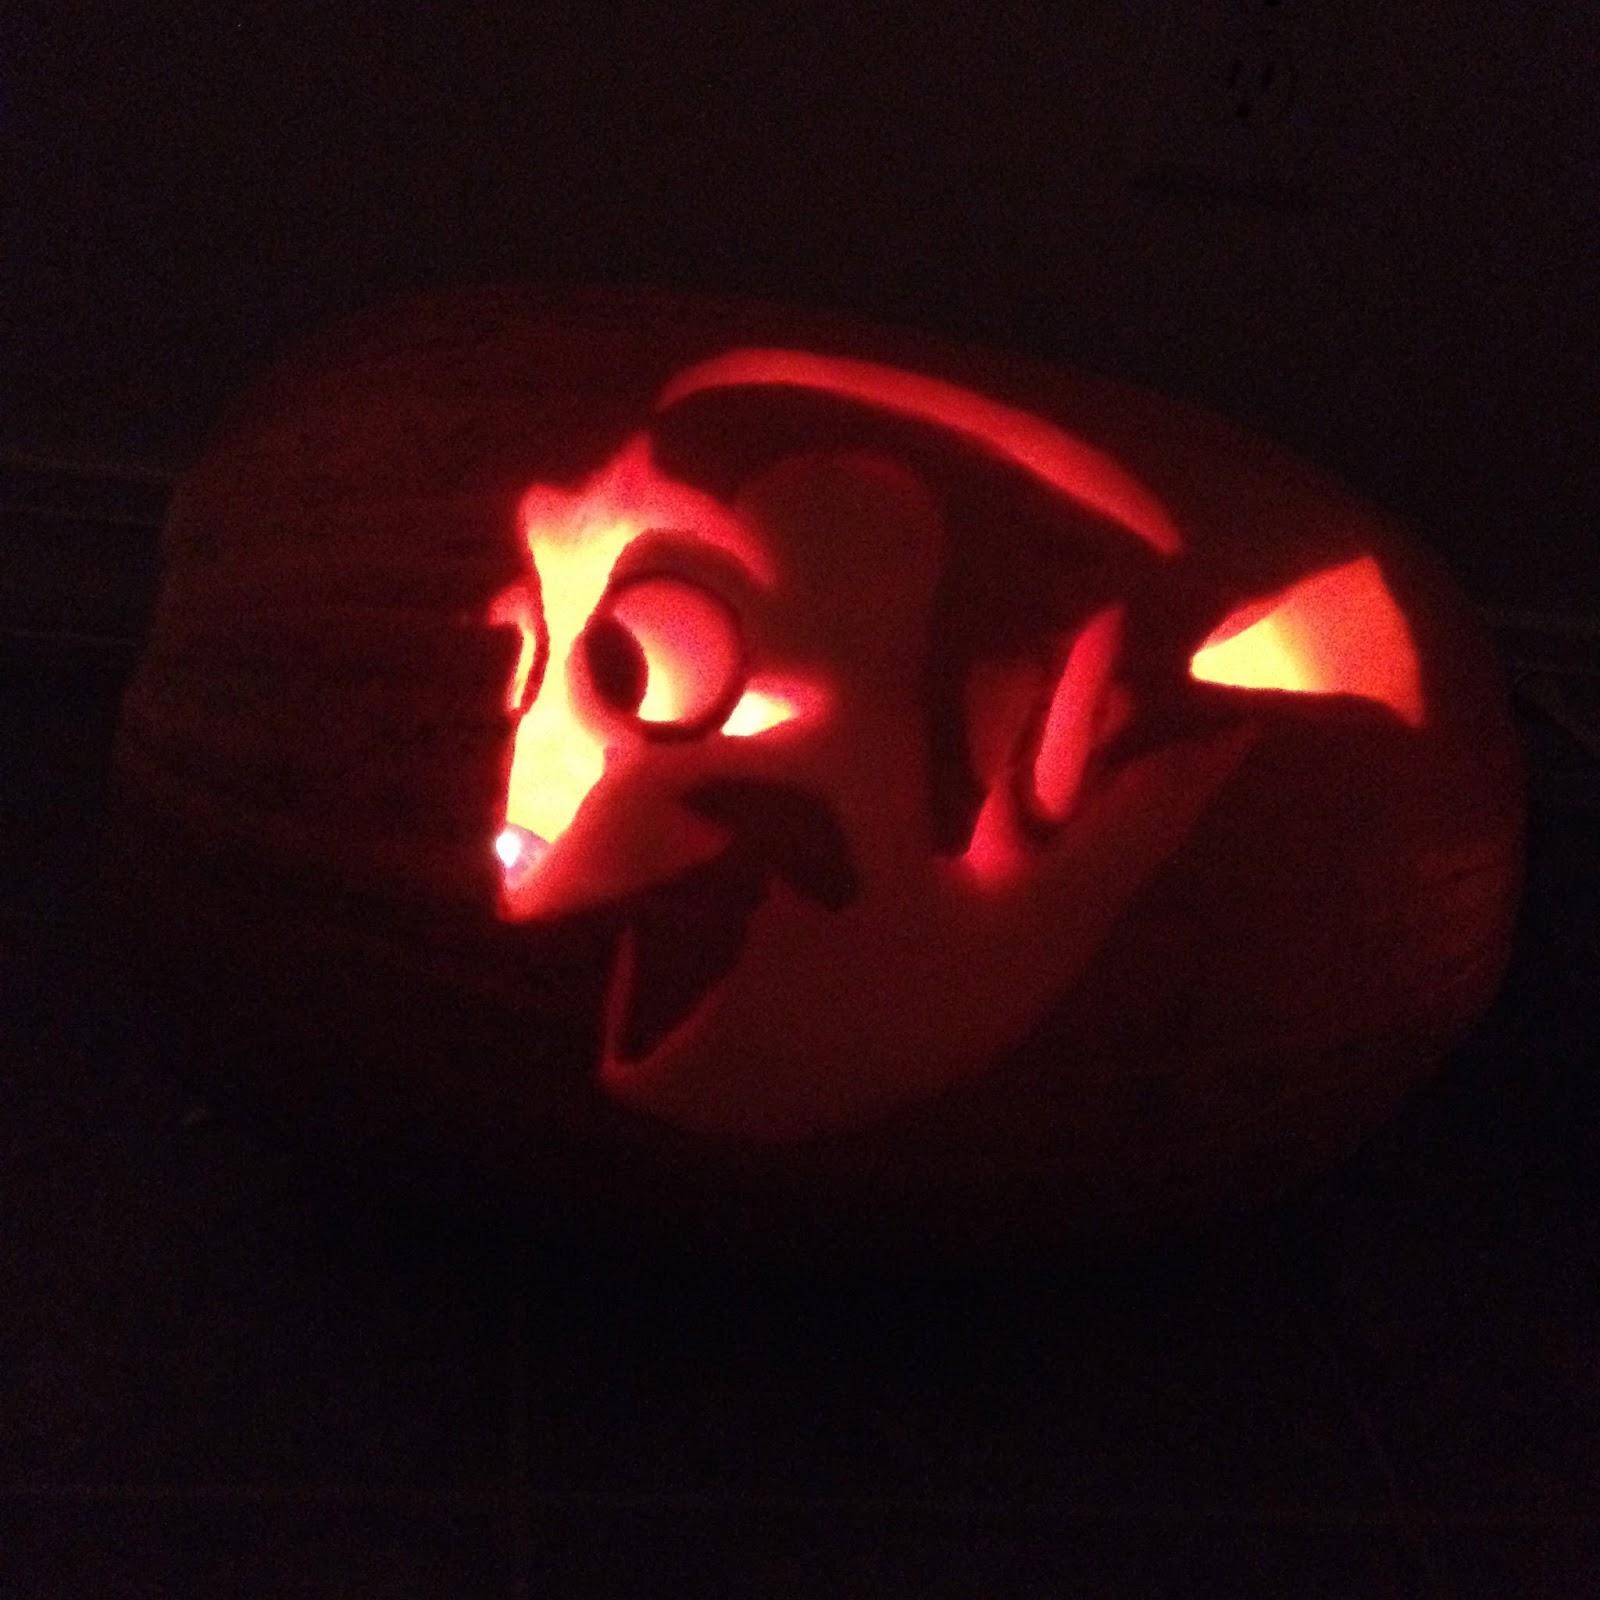 100+ [ Mike Wazowski Pumpkin For The ] | 100 Mike Wazowski Pumpkin ...